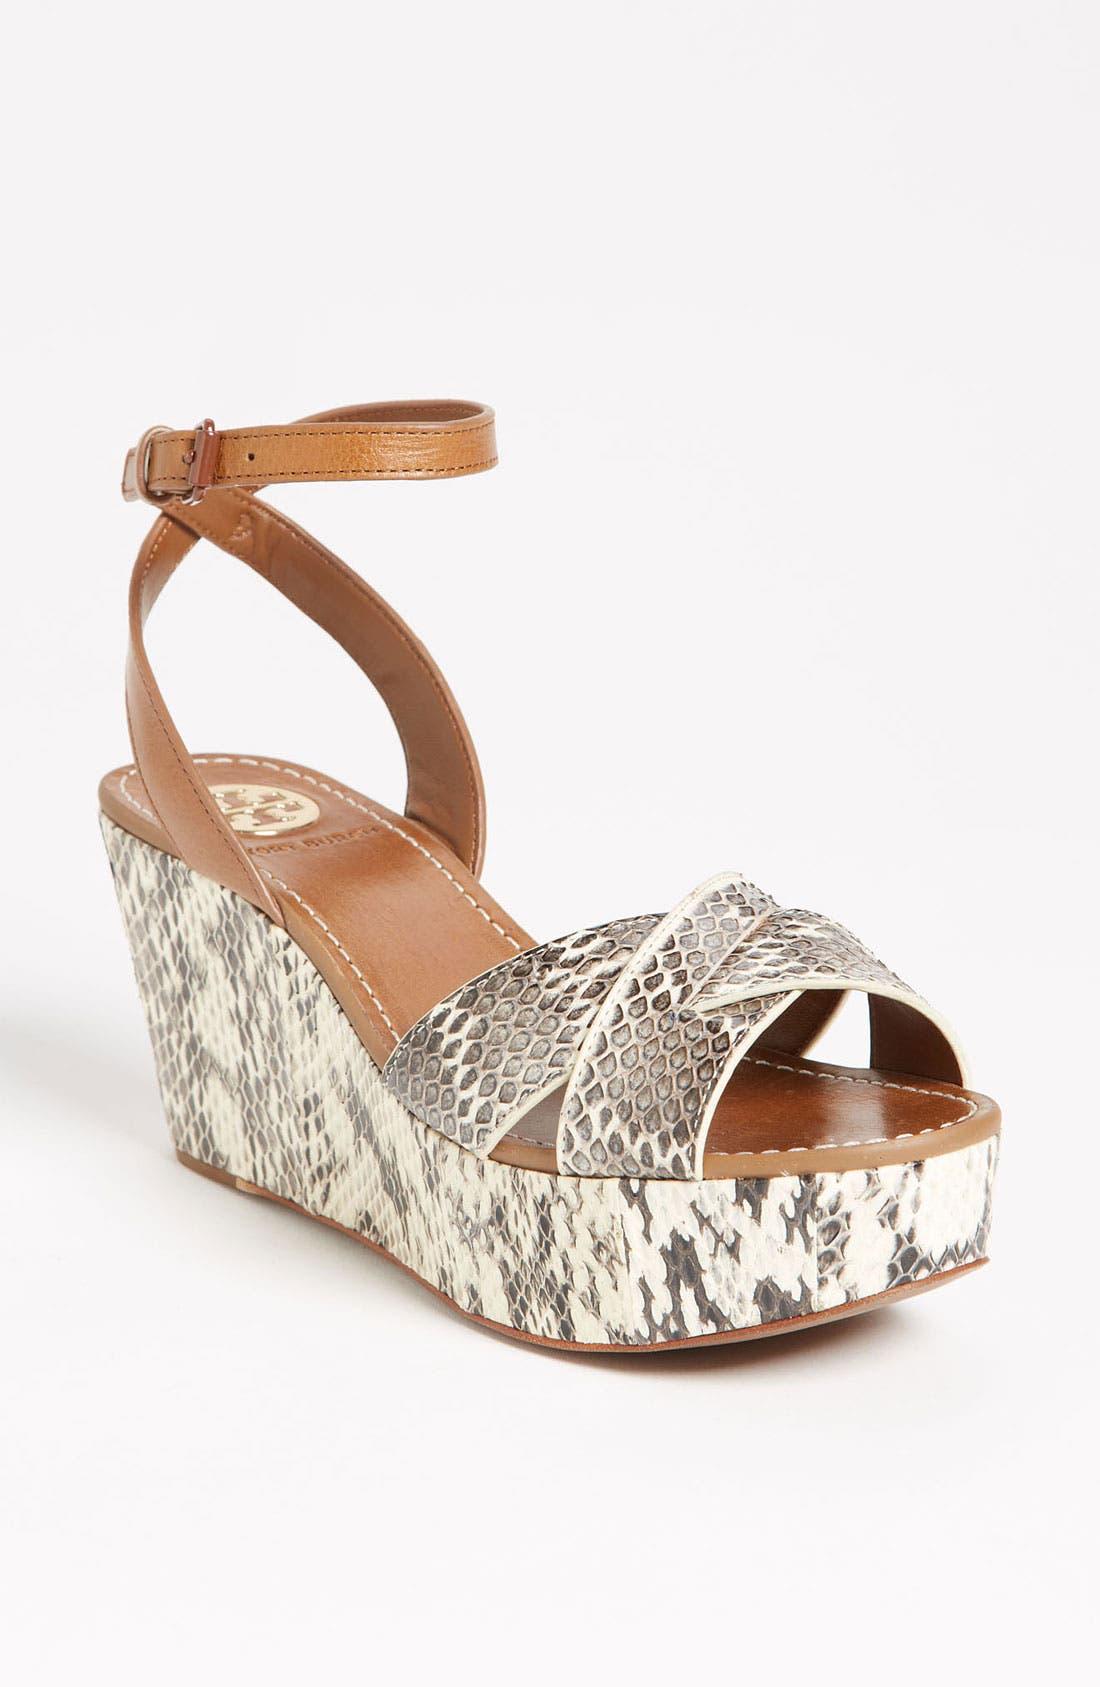 Main Image - Tory Burch 'Cathleen' Sandal